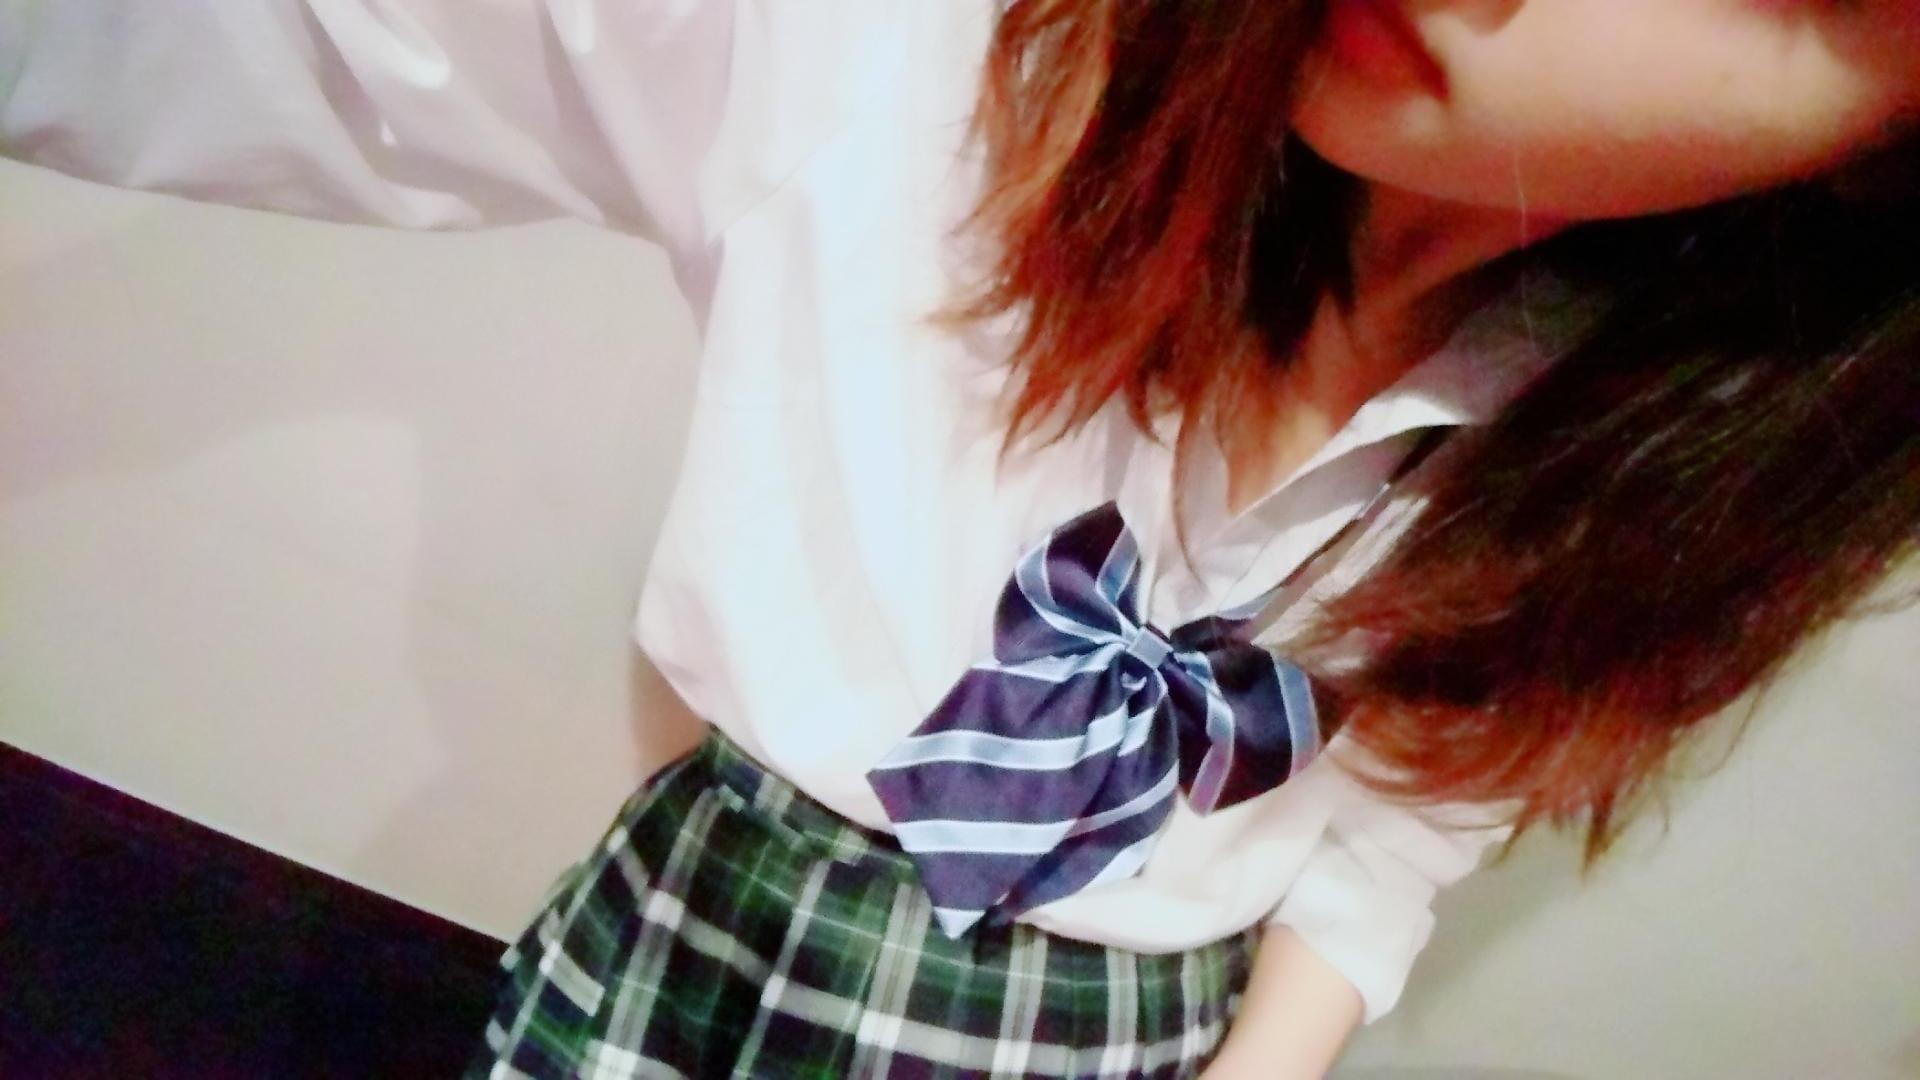 「No79 中本」02/21日(水) 00:39 | 中本の写メ・風俗動画